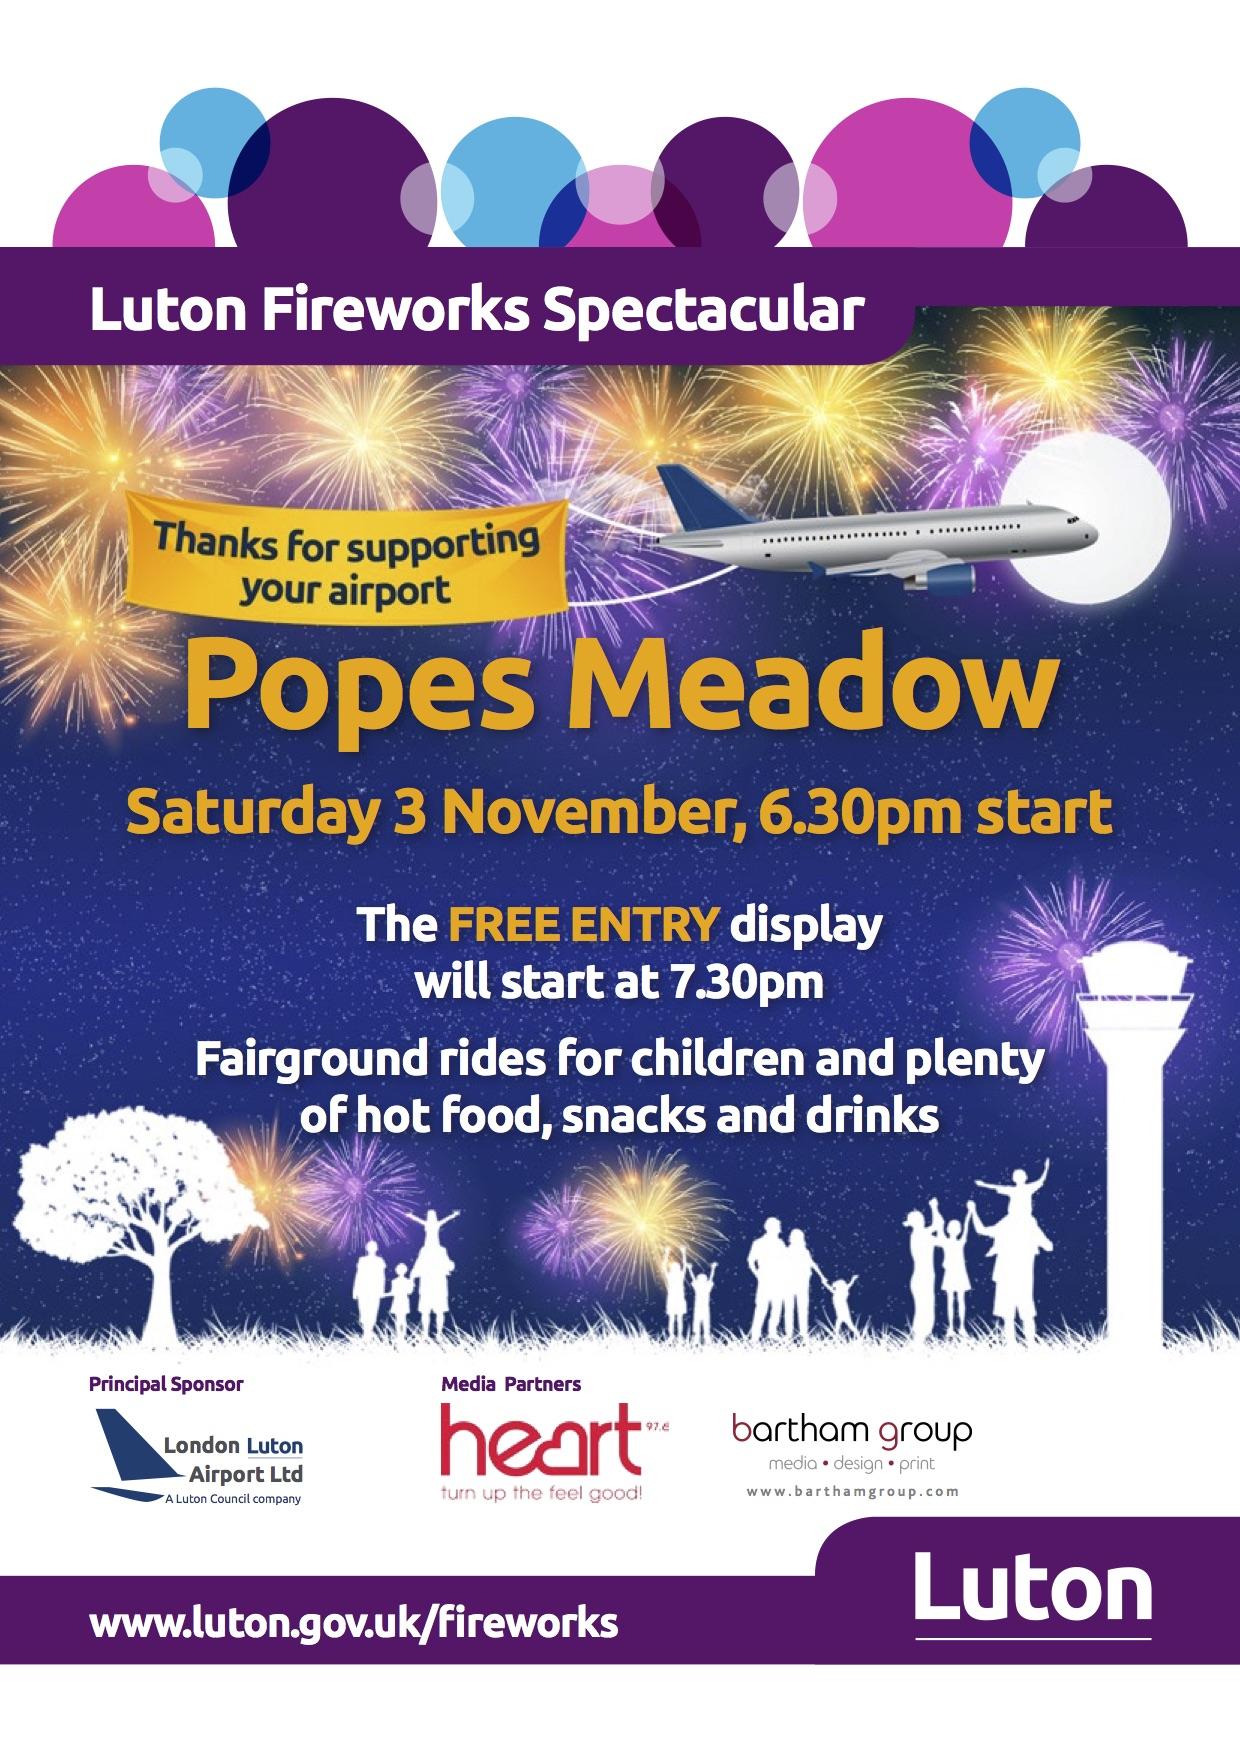 Luton Fireworks 2018 Poster